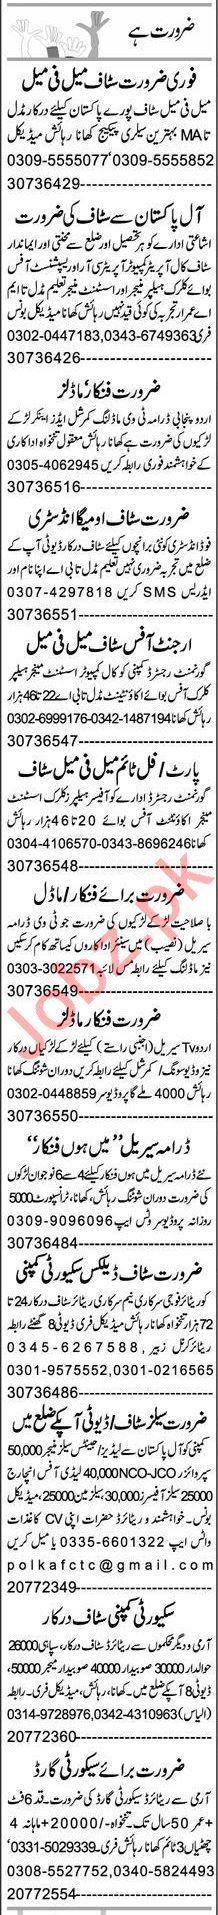 Express Sunday Multan Classified Ads 12th July 2020